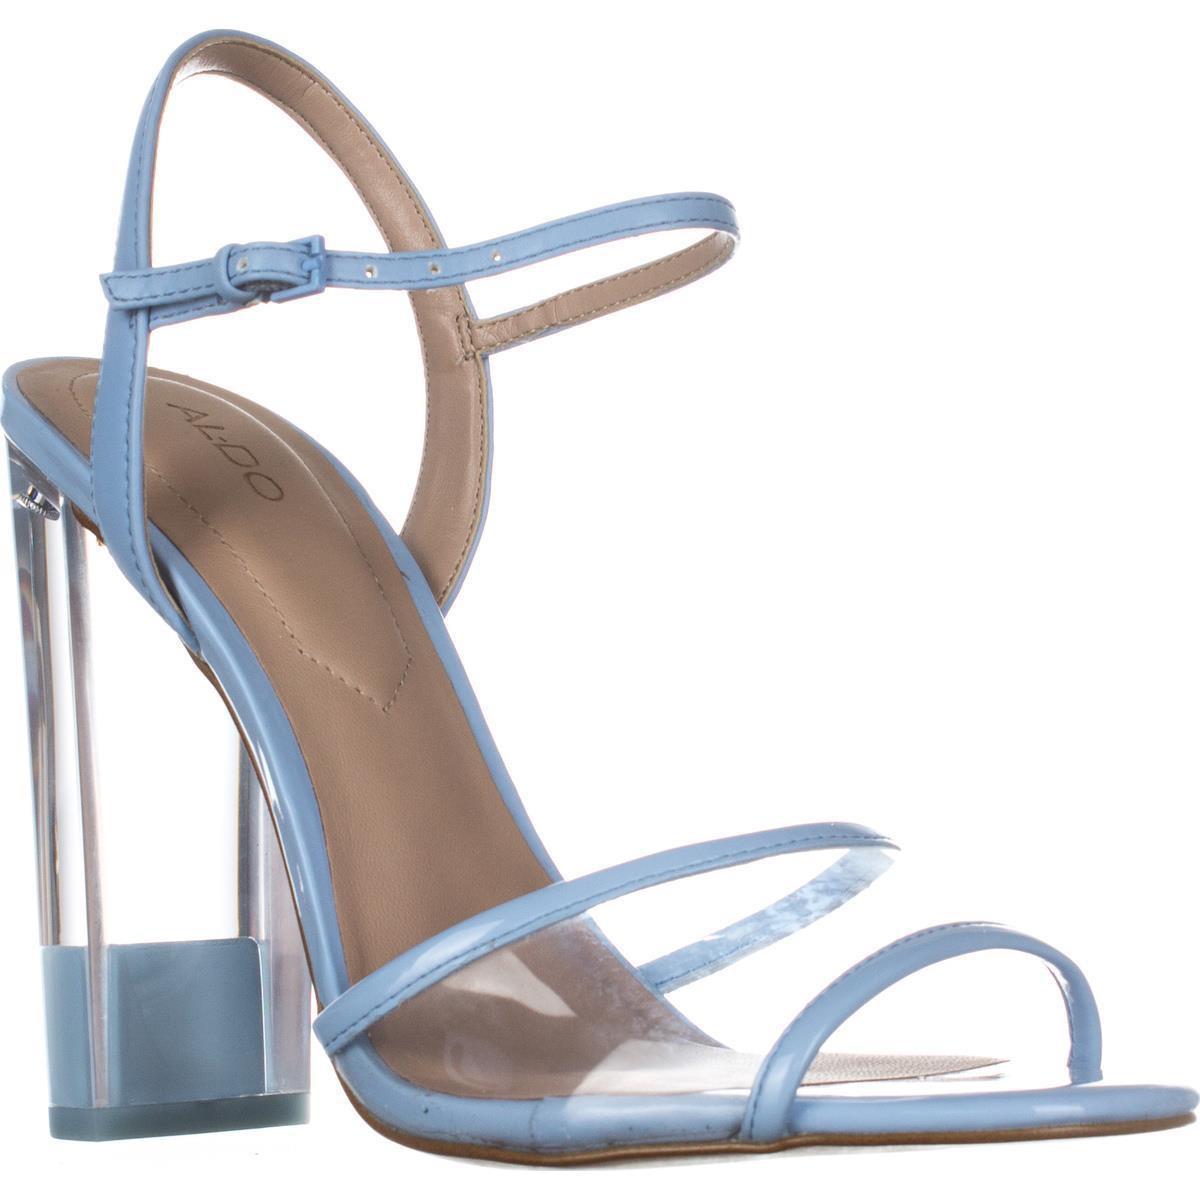 dd65a76d5b00 Lyst - Aldo Camylla Ankle Strap Block Heel Dress Sandals in Blue